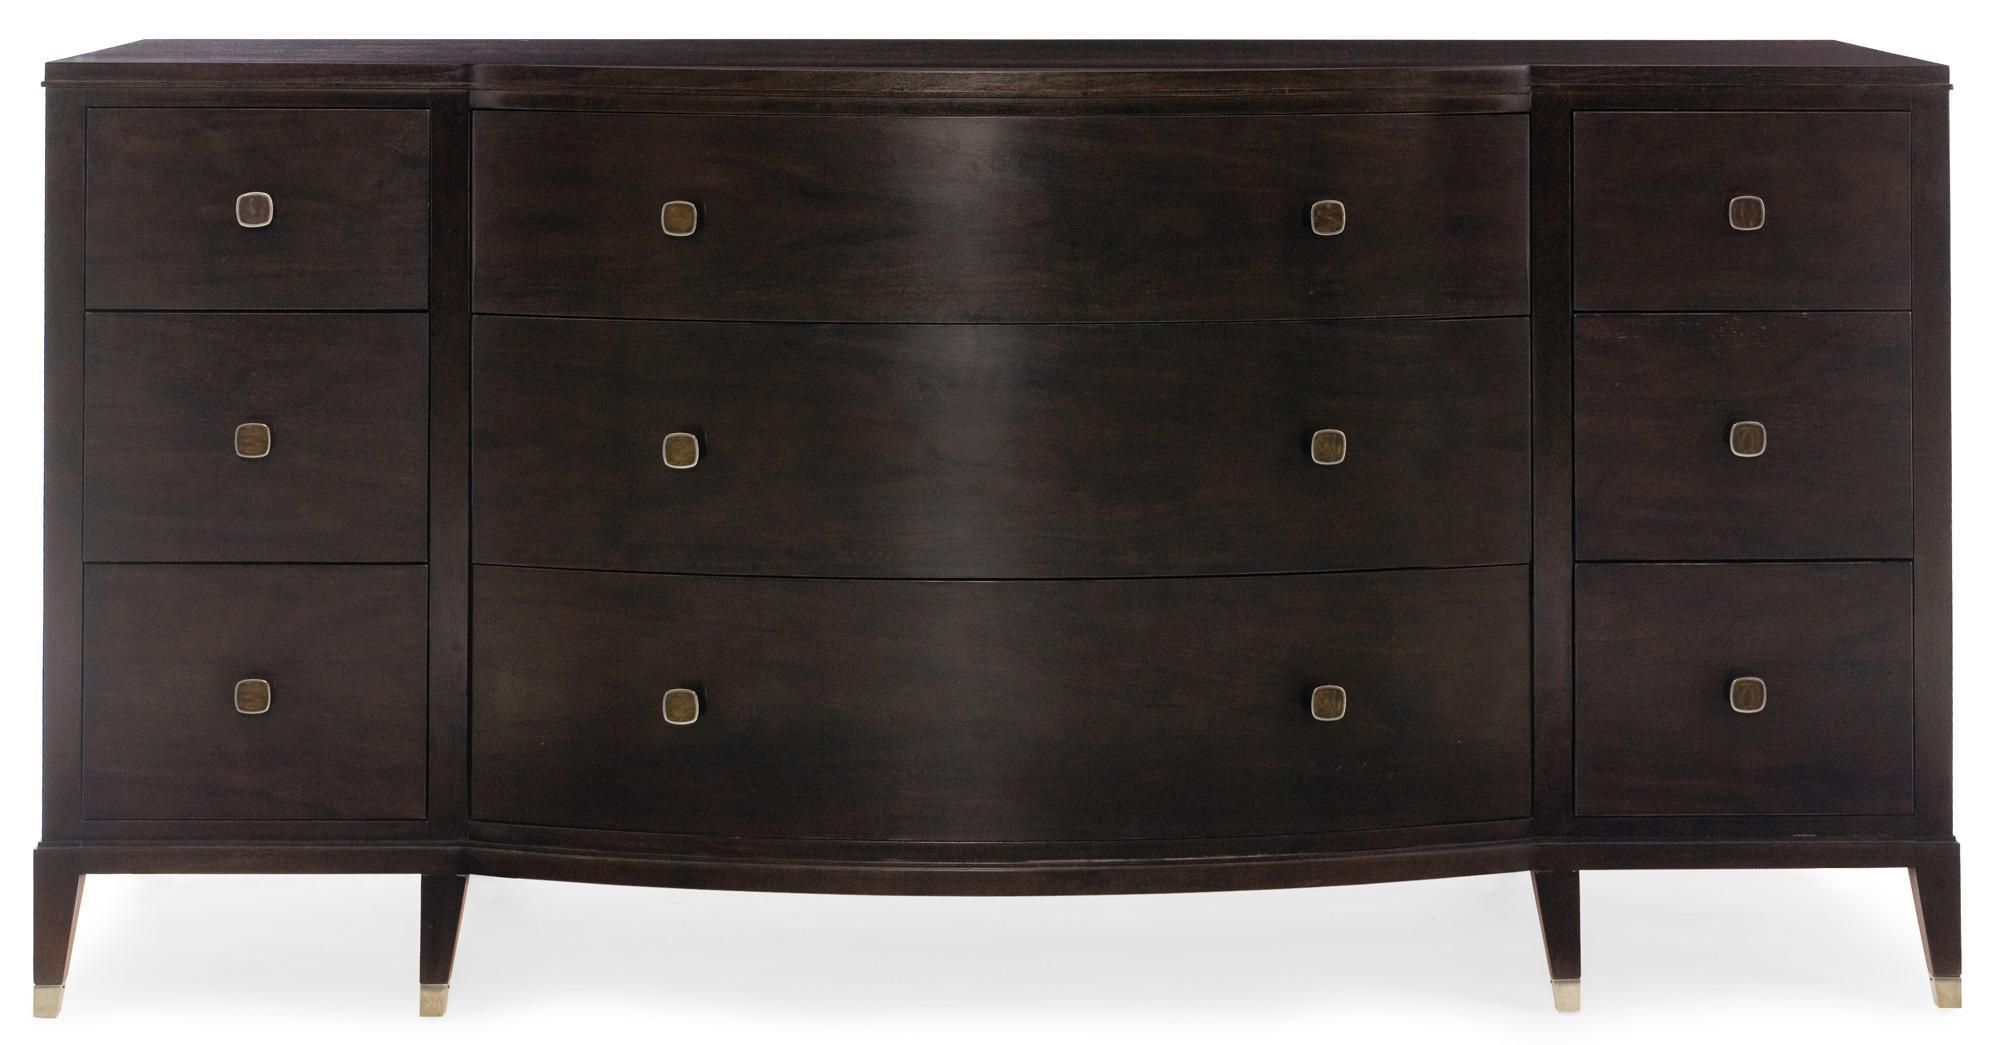 Bernhardt Haven Hawkins Dresser - Item Number: 346-054R